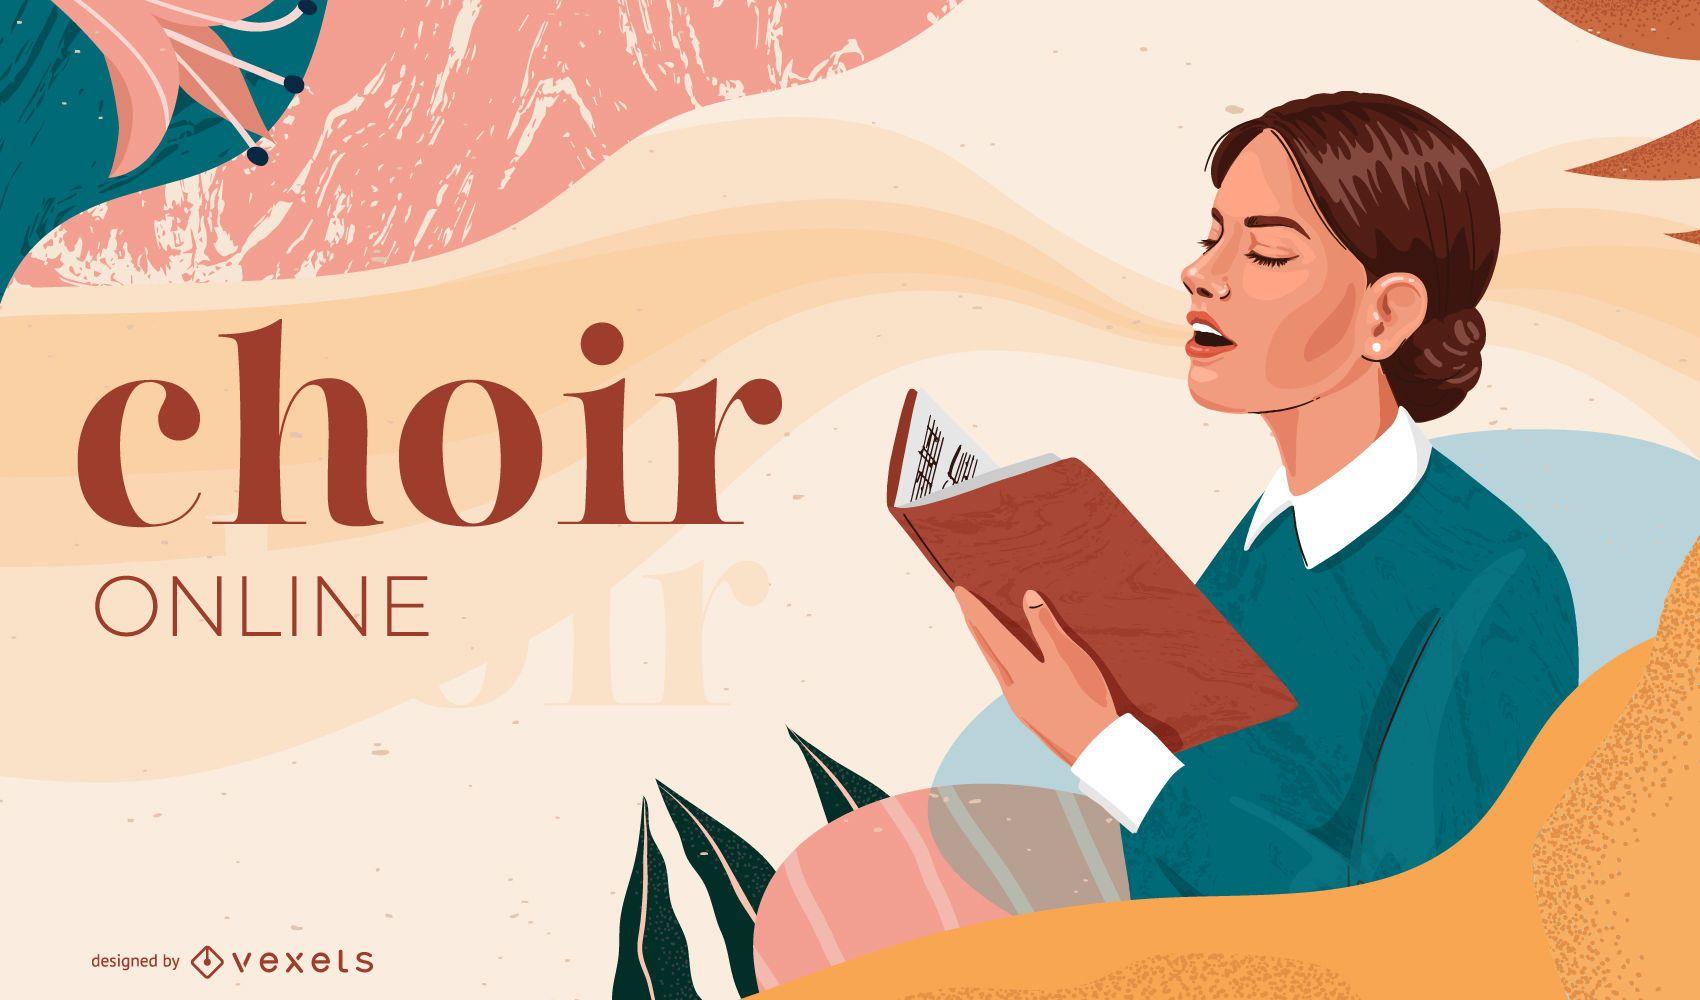 Chor Online Cover Design